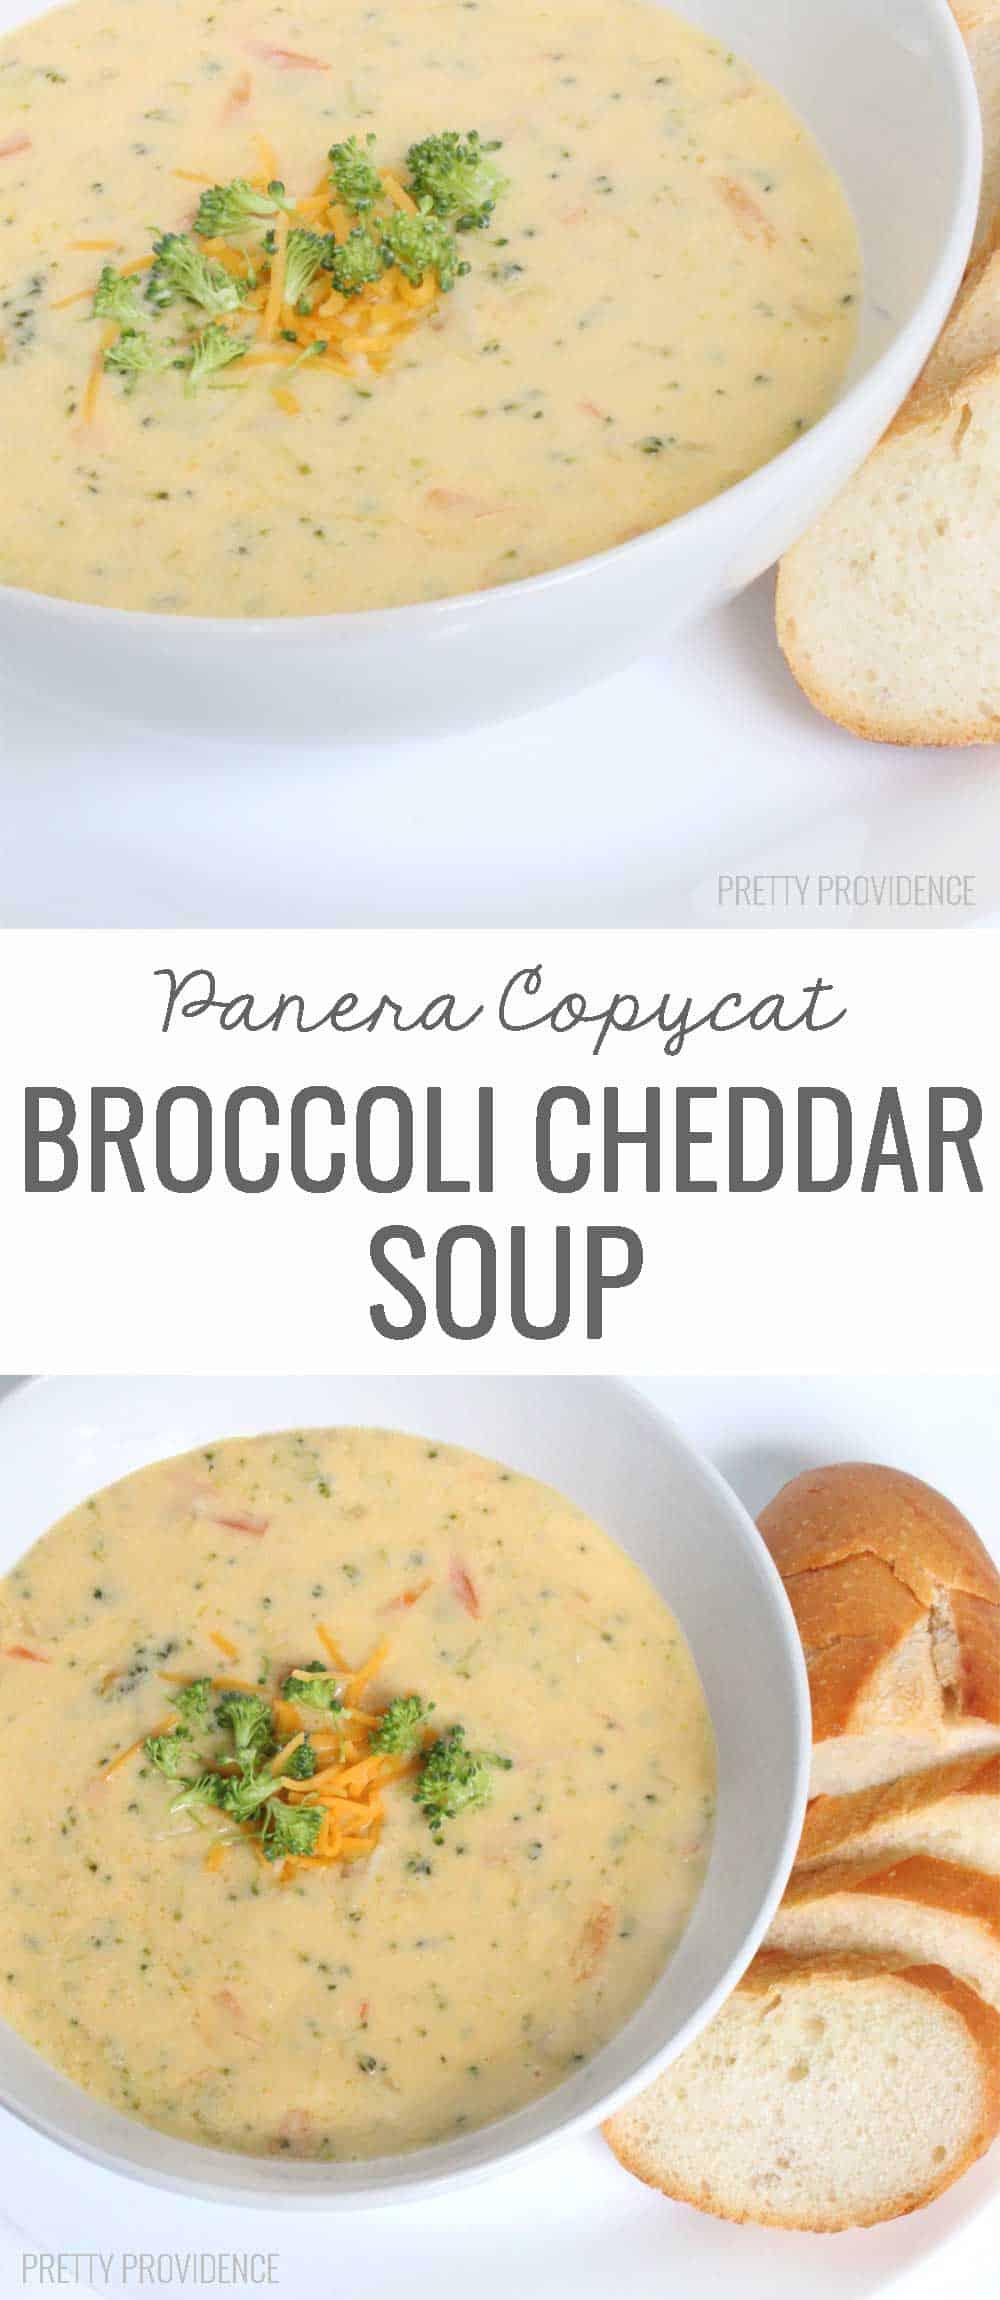 panera-broccoli-cheddar-soup-pin